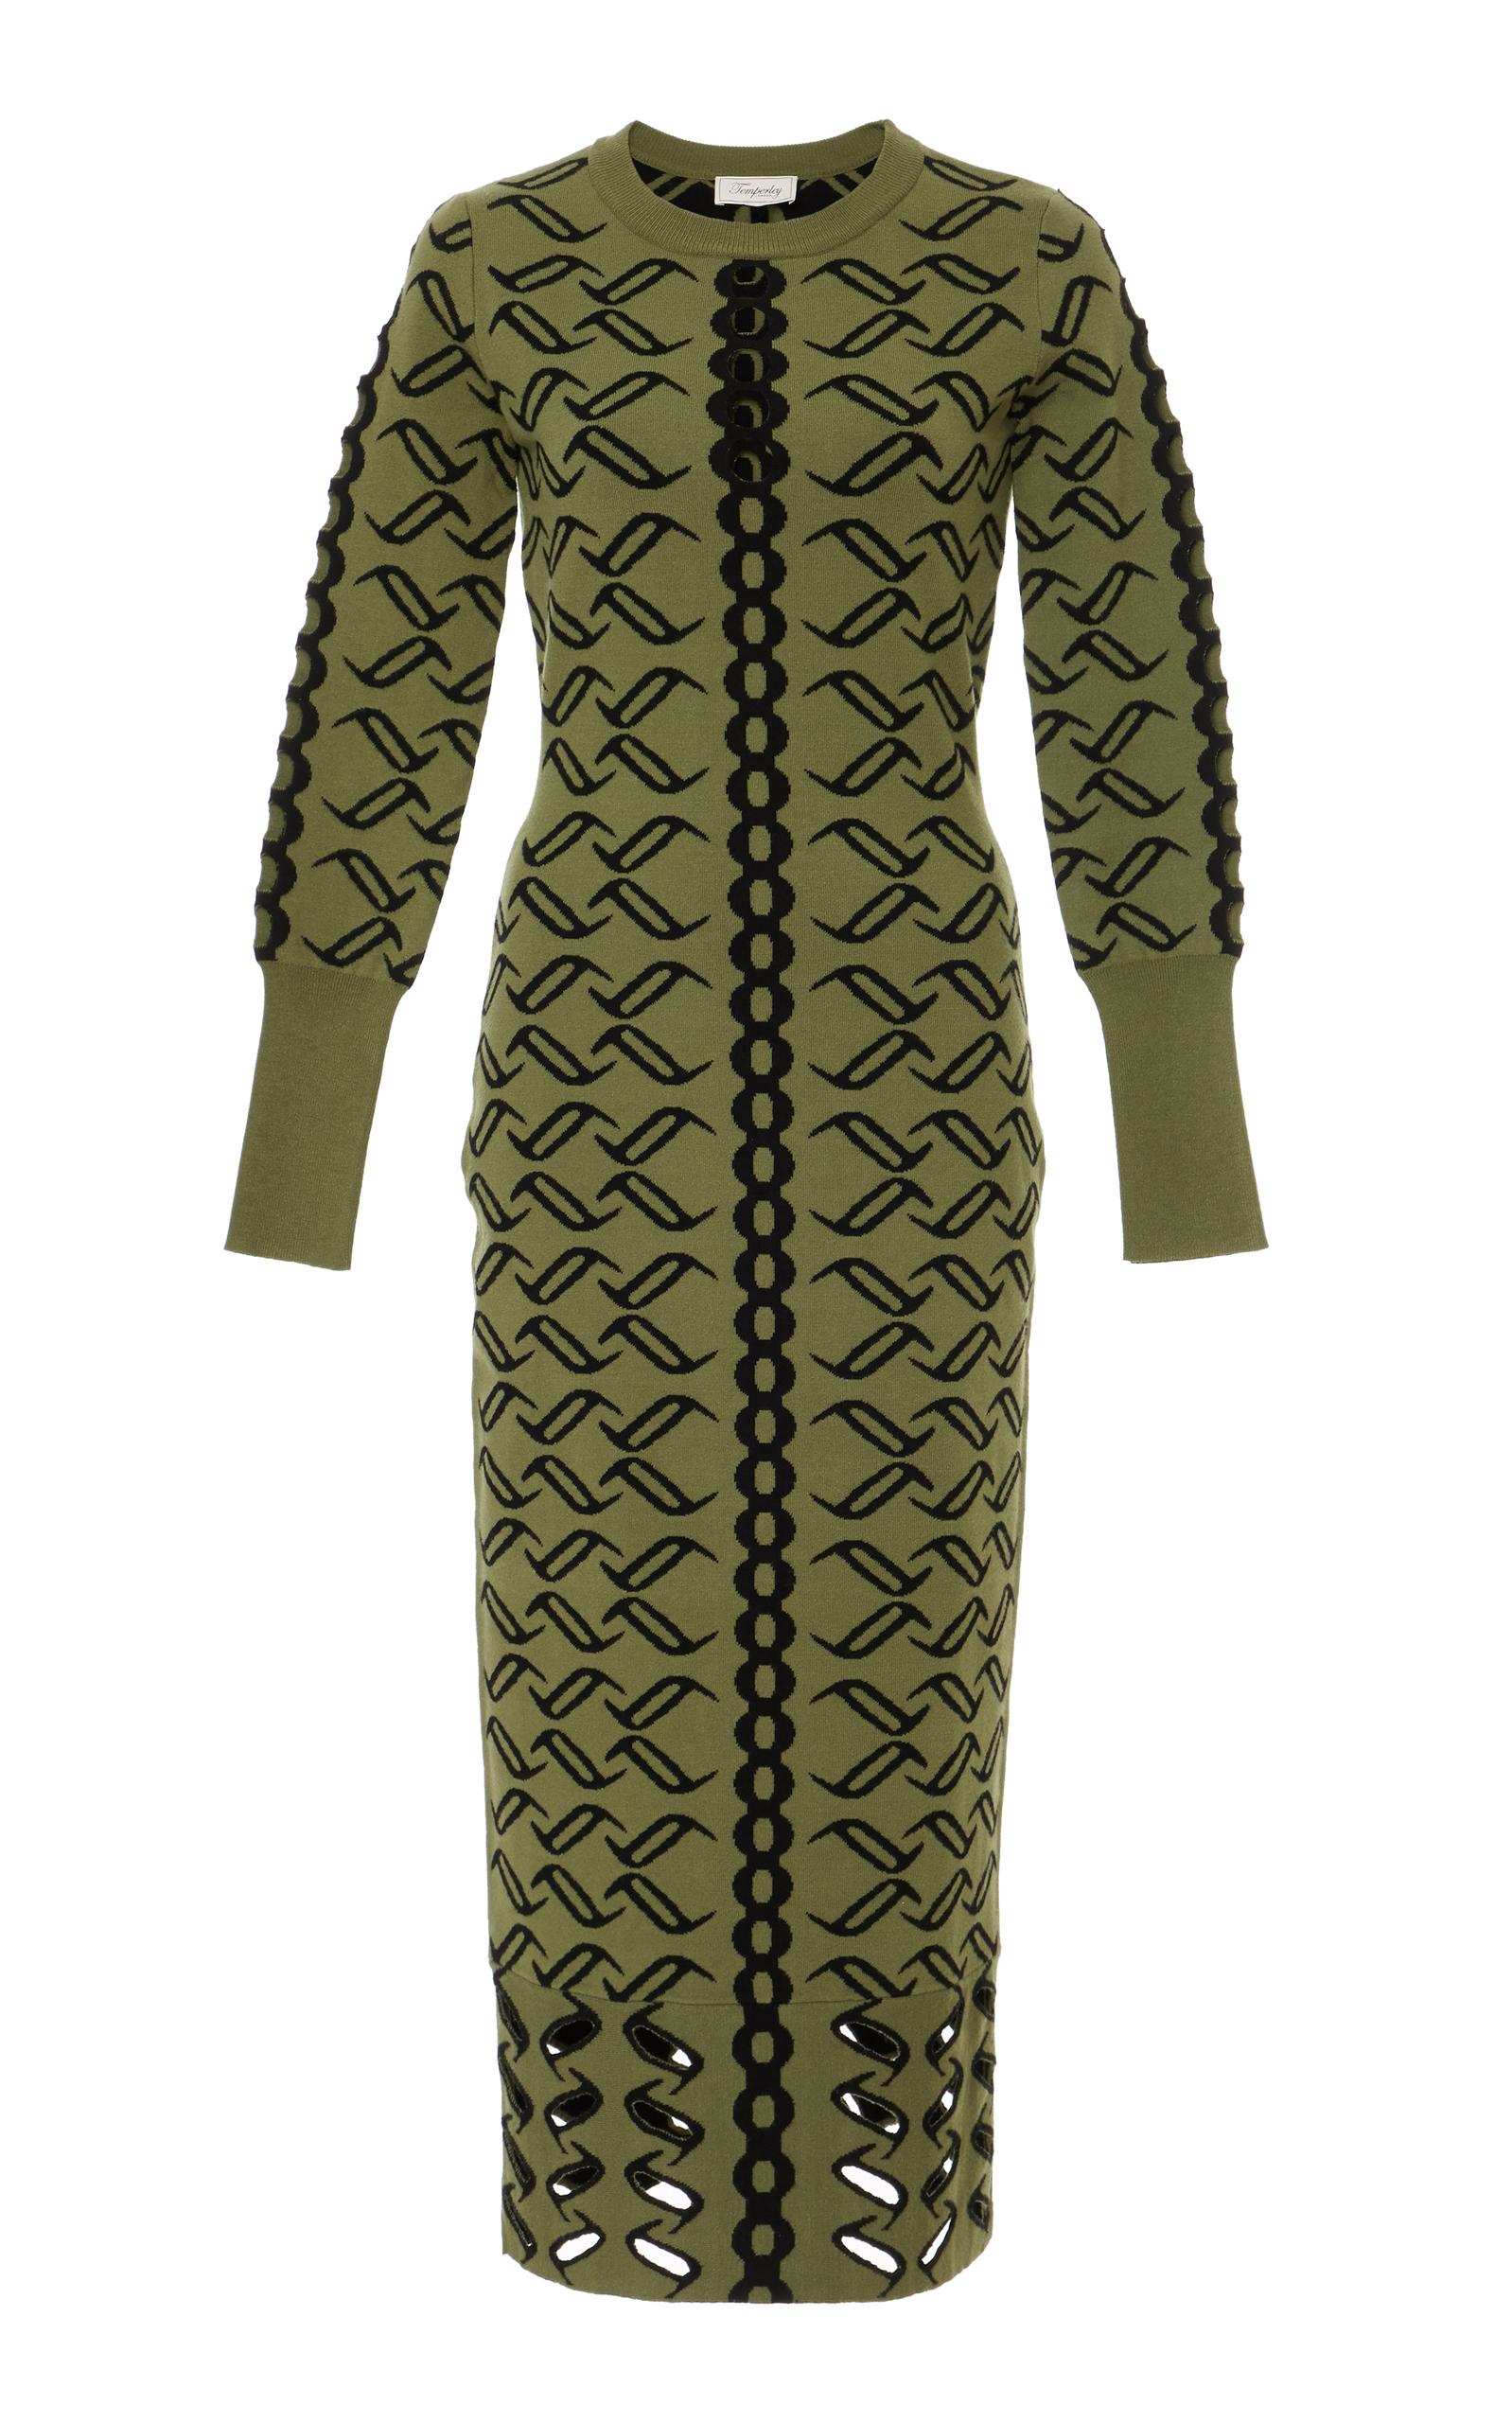 TEMPERLEY LONDON Desert Knit Dress in Green